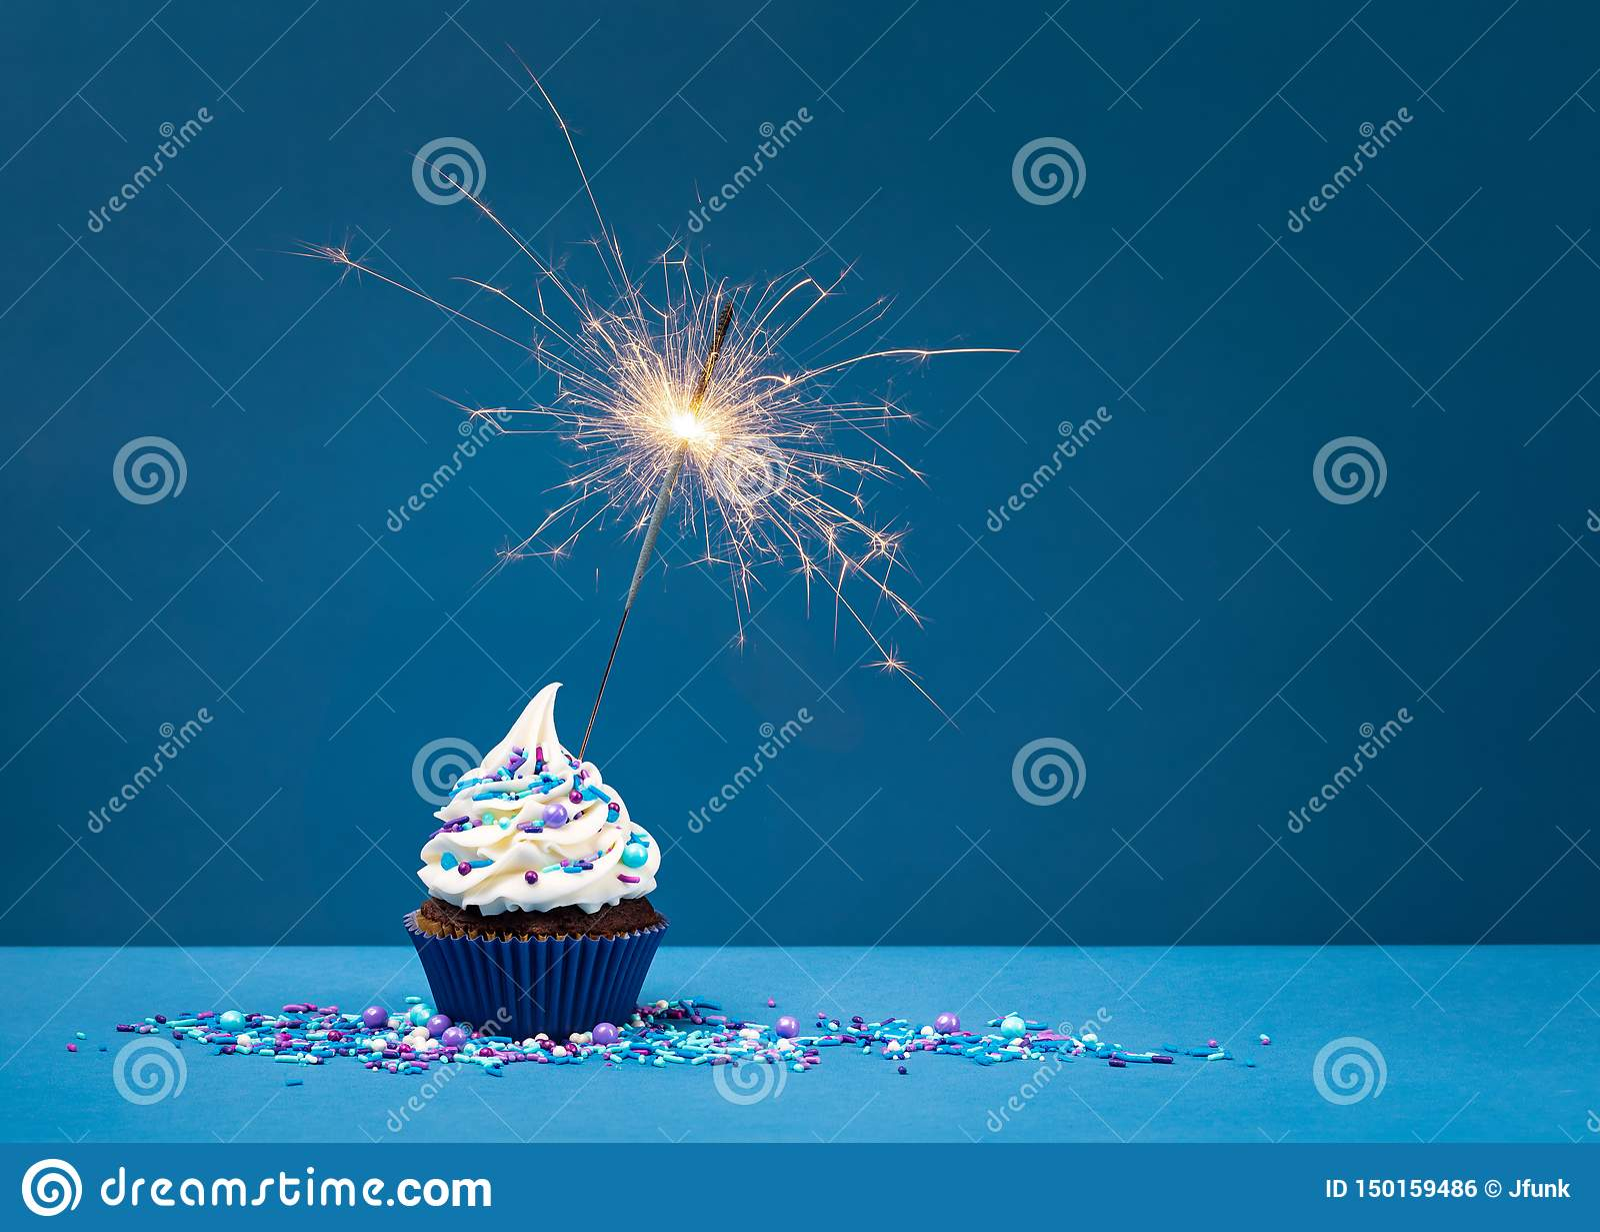 Birthday Cupcake on blue with sparkler